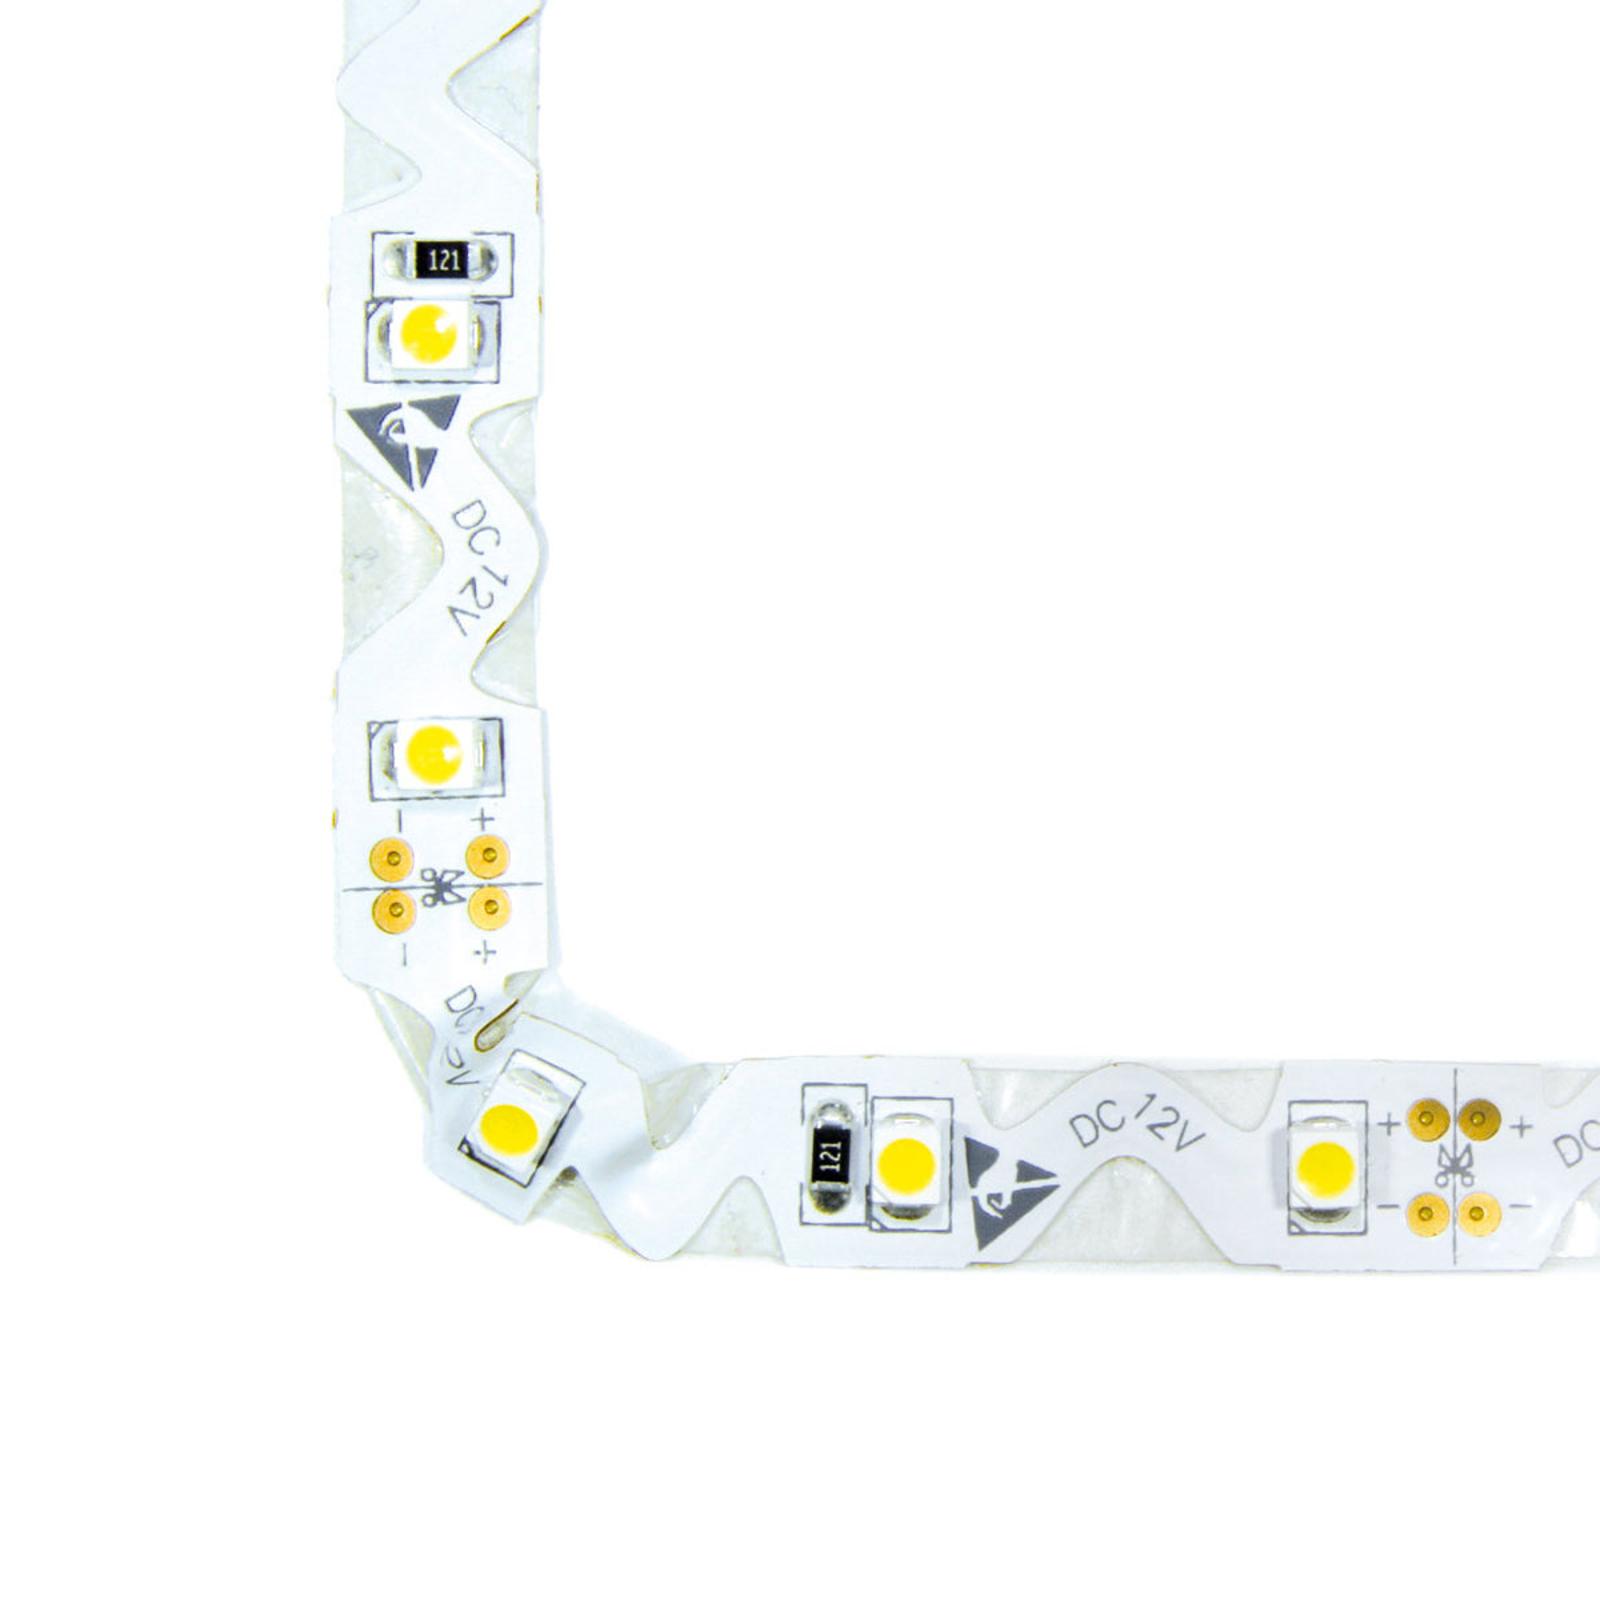 Fleksible LED-striper med varmhvit lysfarge